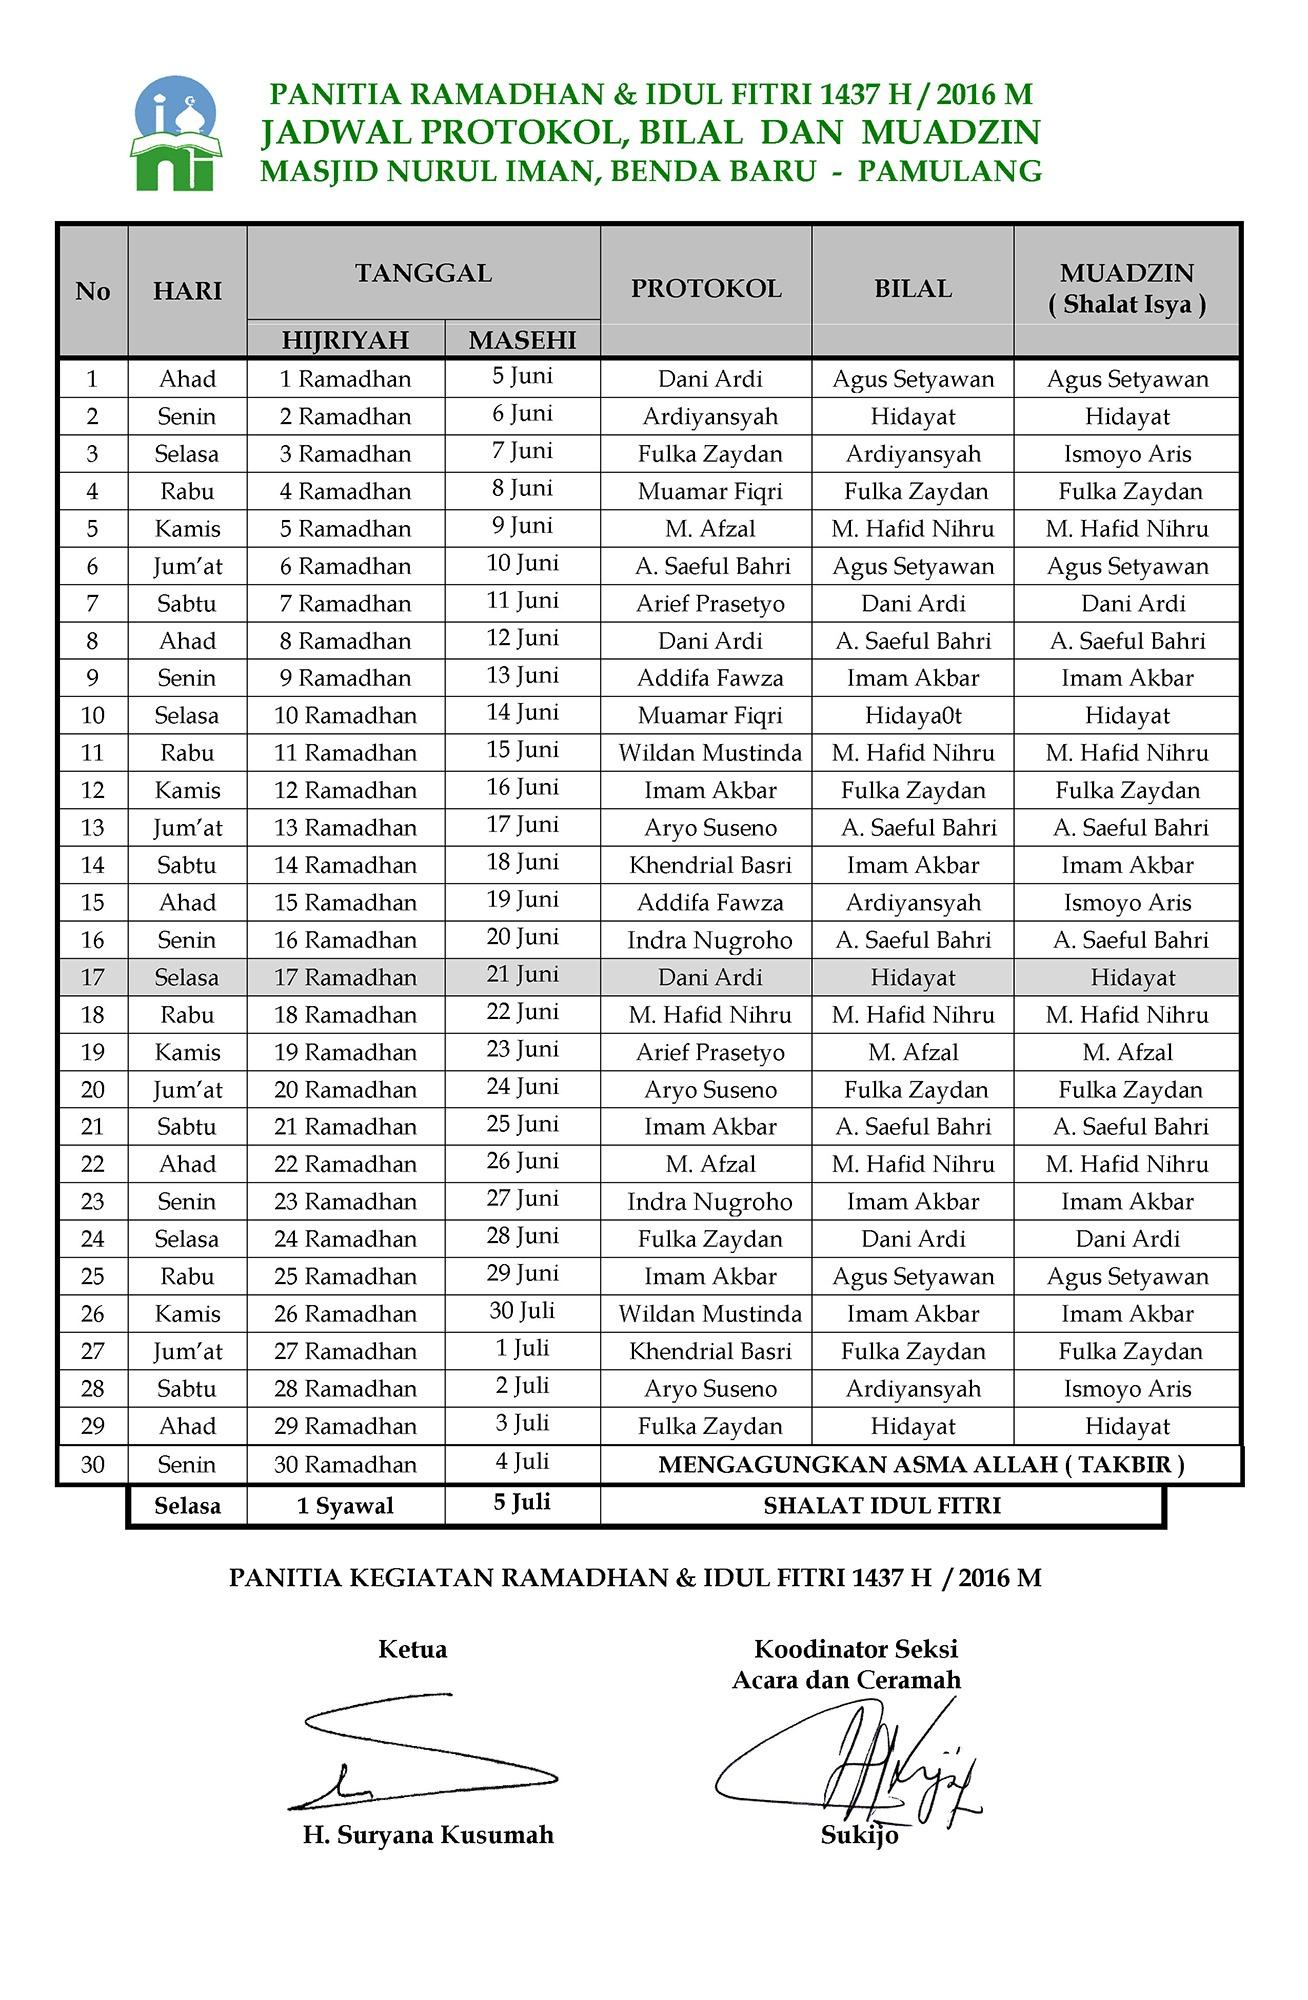 Jadwal Protokol Bilal, Muazin Warna